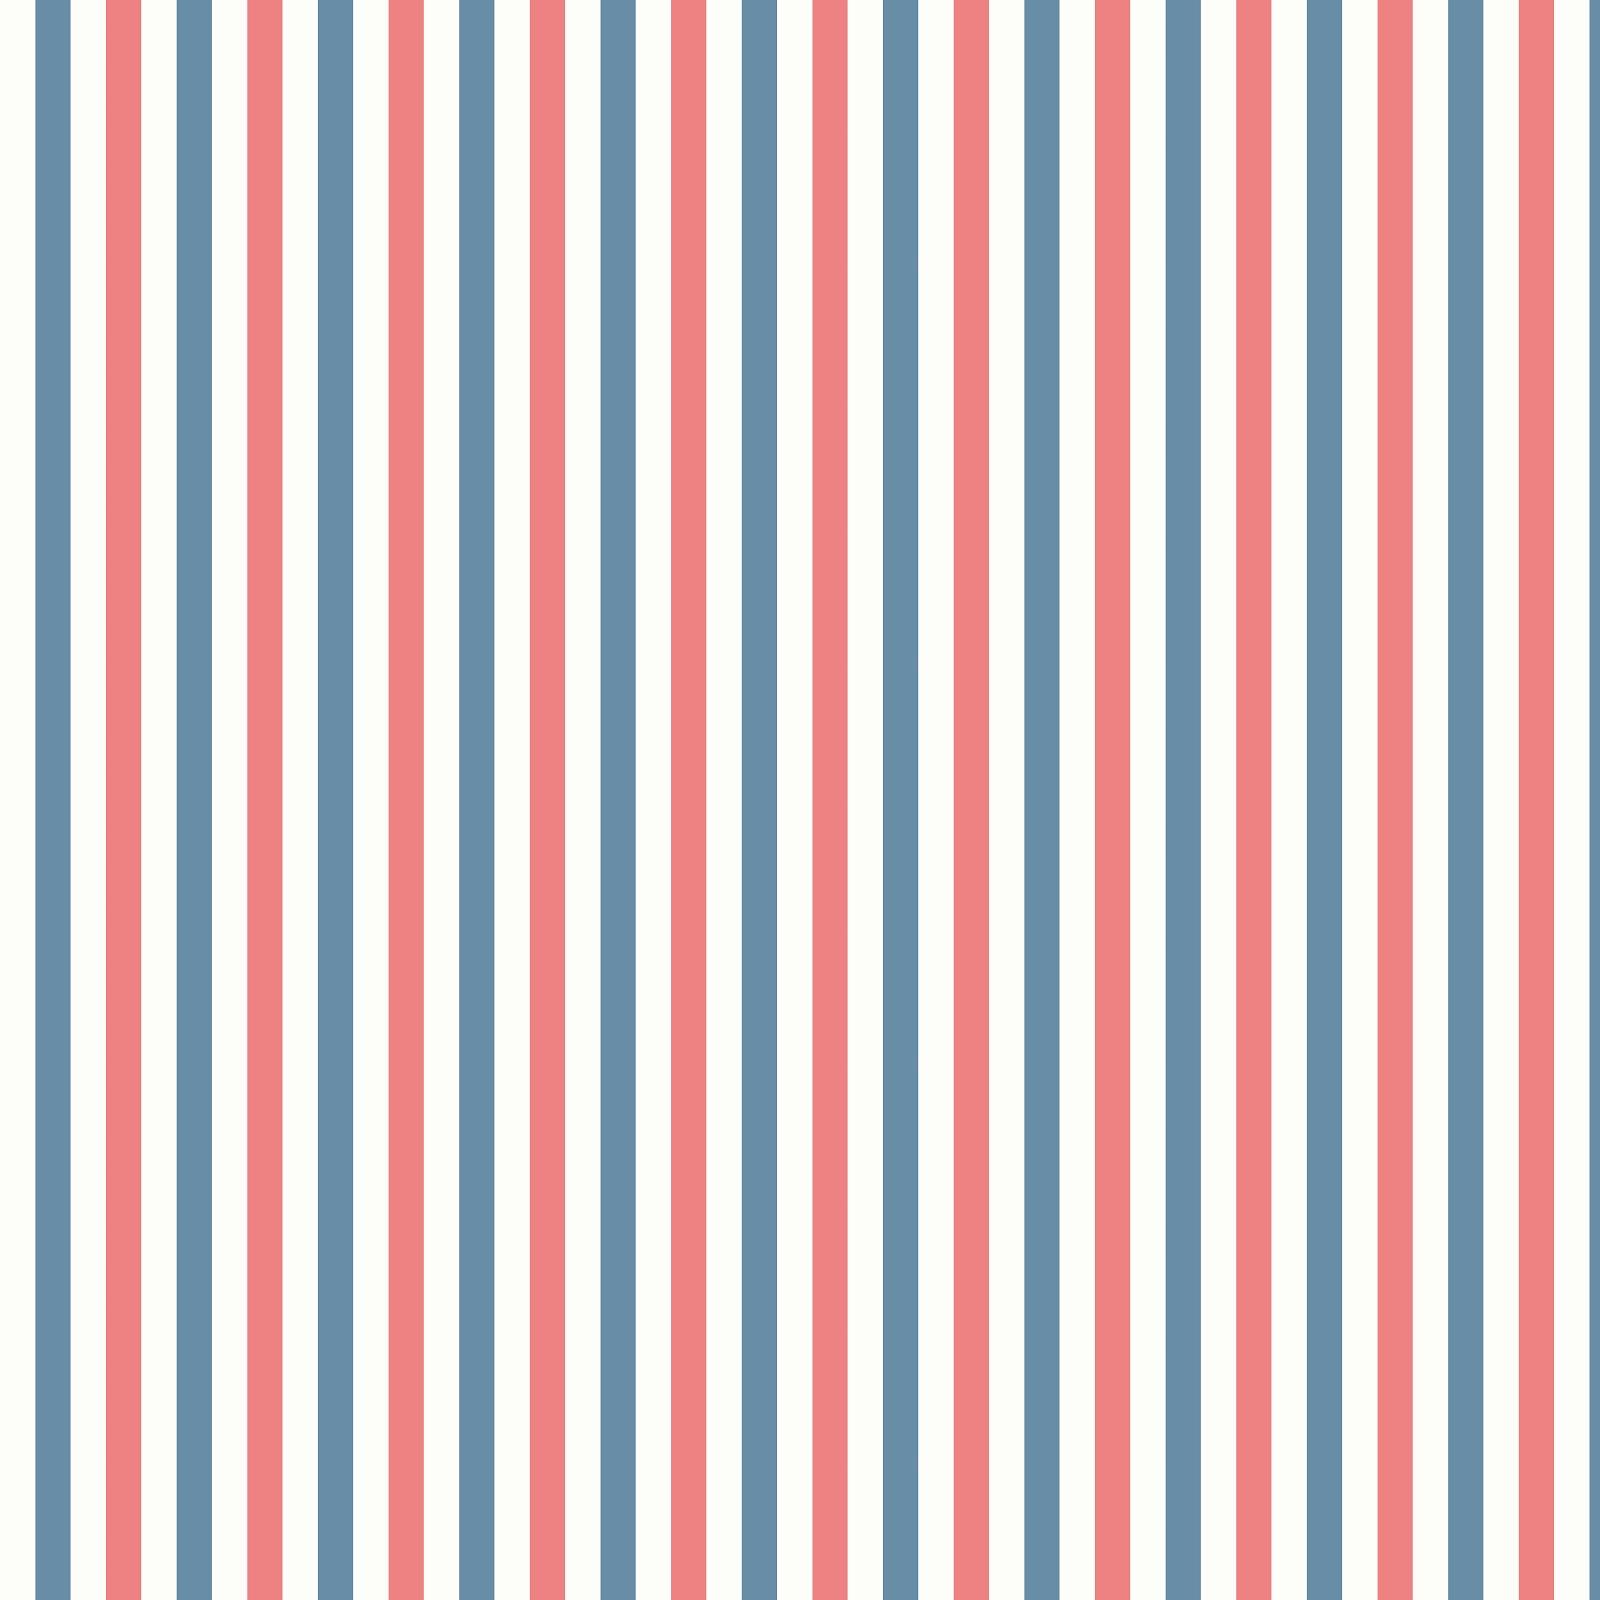 Bonjourvintage: Free Digital Scrapbook Paper - Red White And Blue - Free Printable Patriotic Scrapbook Paper